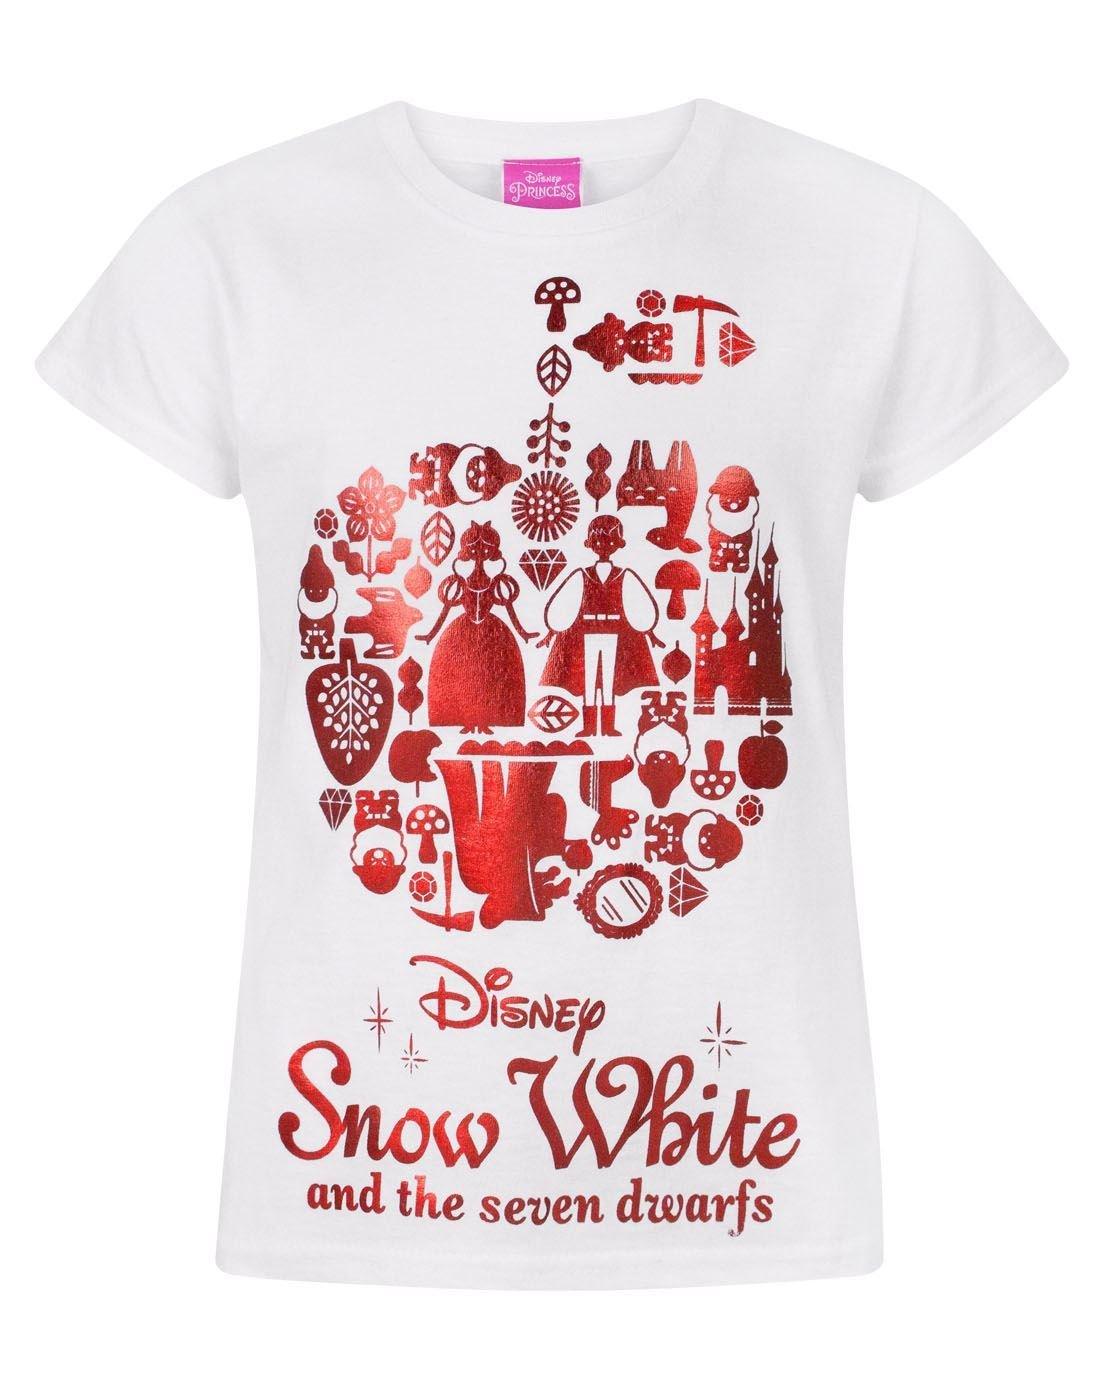 Disney Snow White Red Foil Girl's T-Shirt Fashion UK